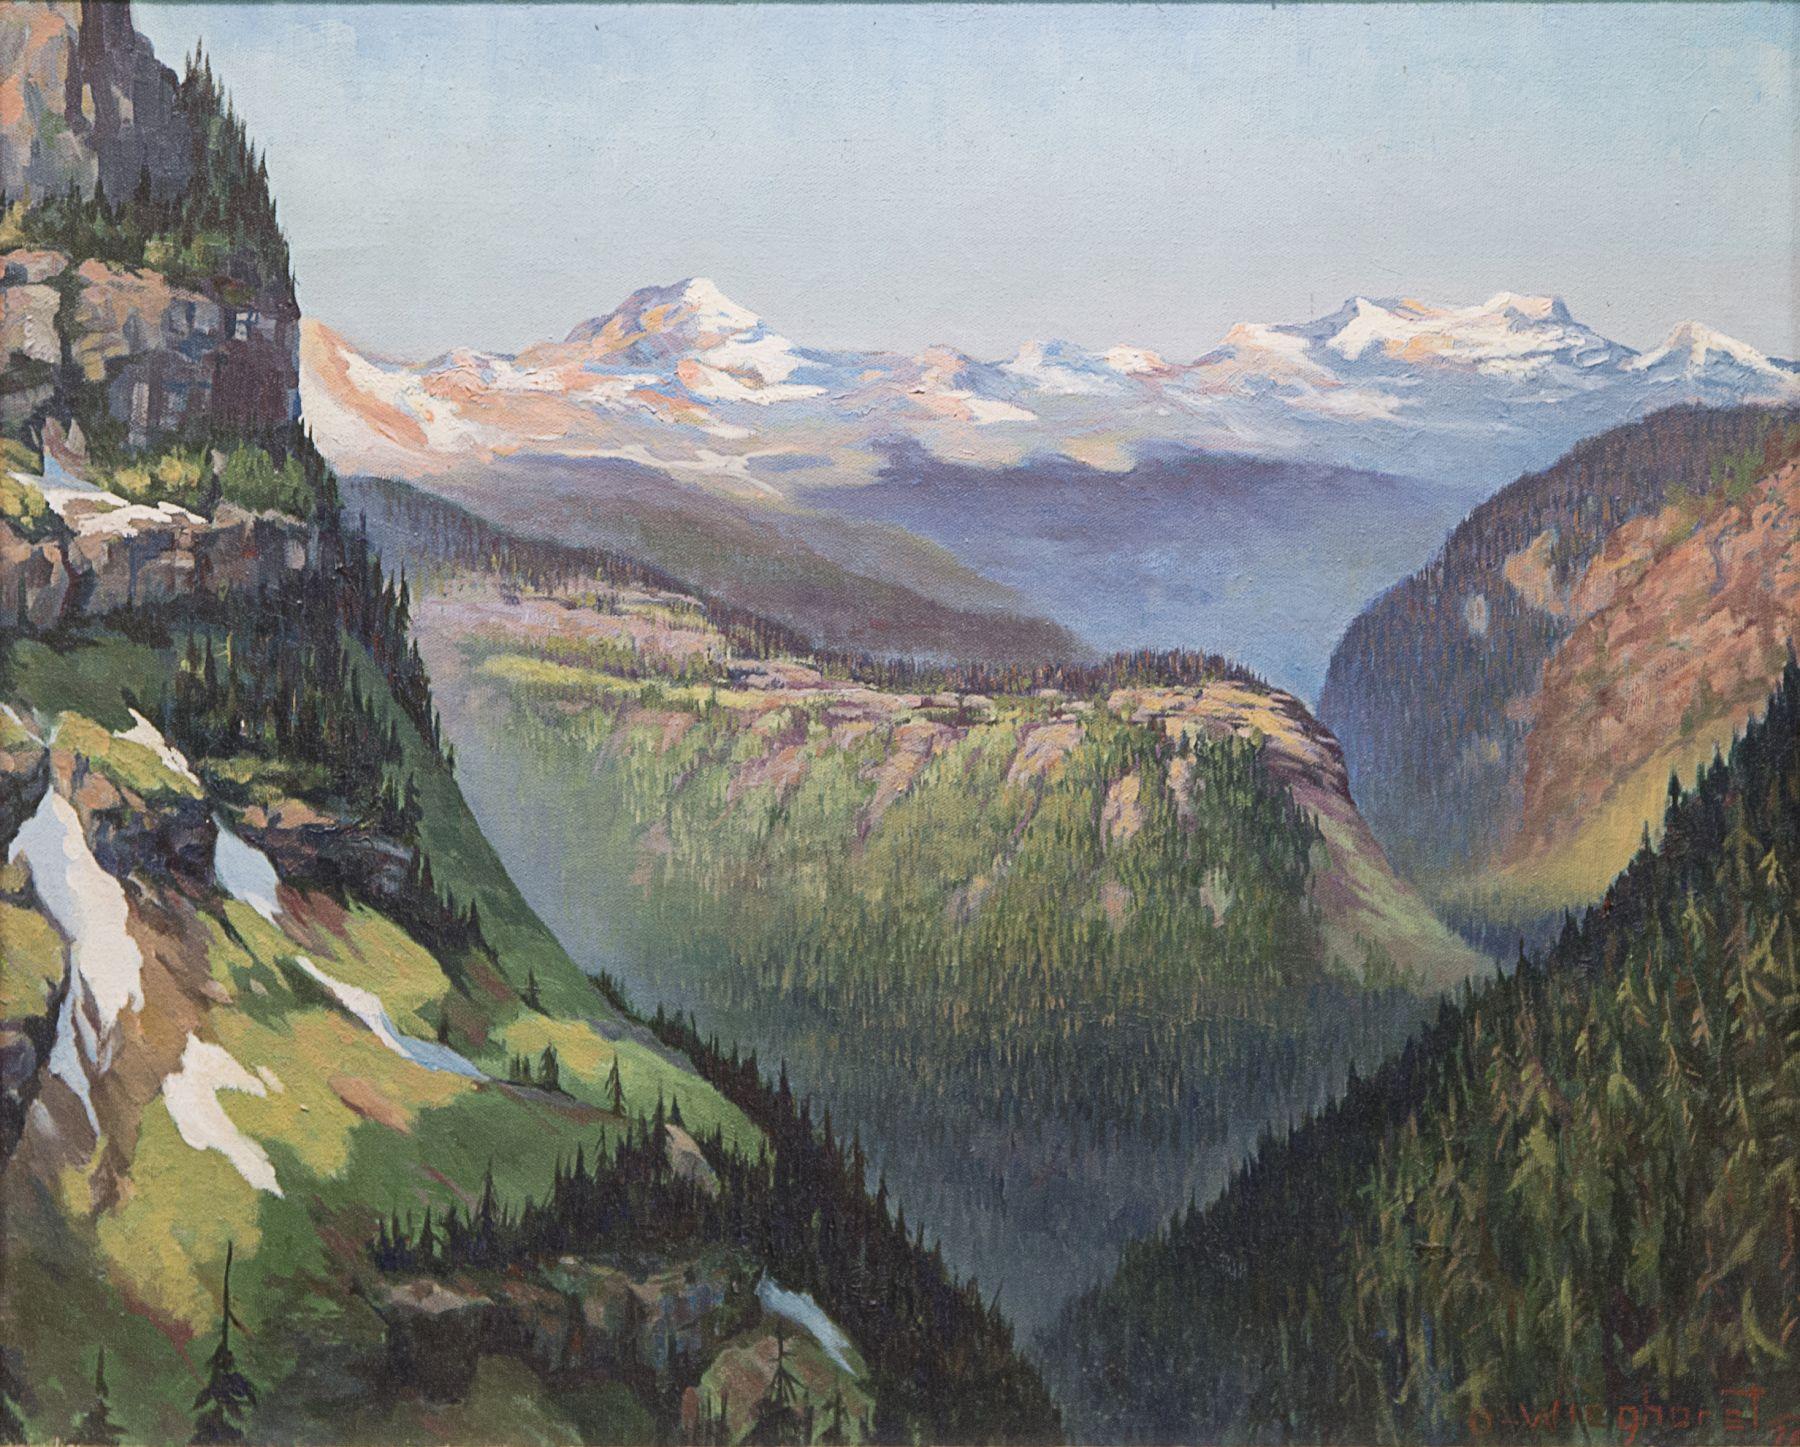 Olaf Wieghorst, Glacier National Park, Montana, western art, landscape